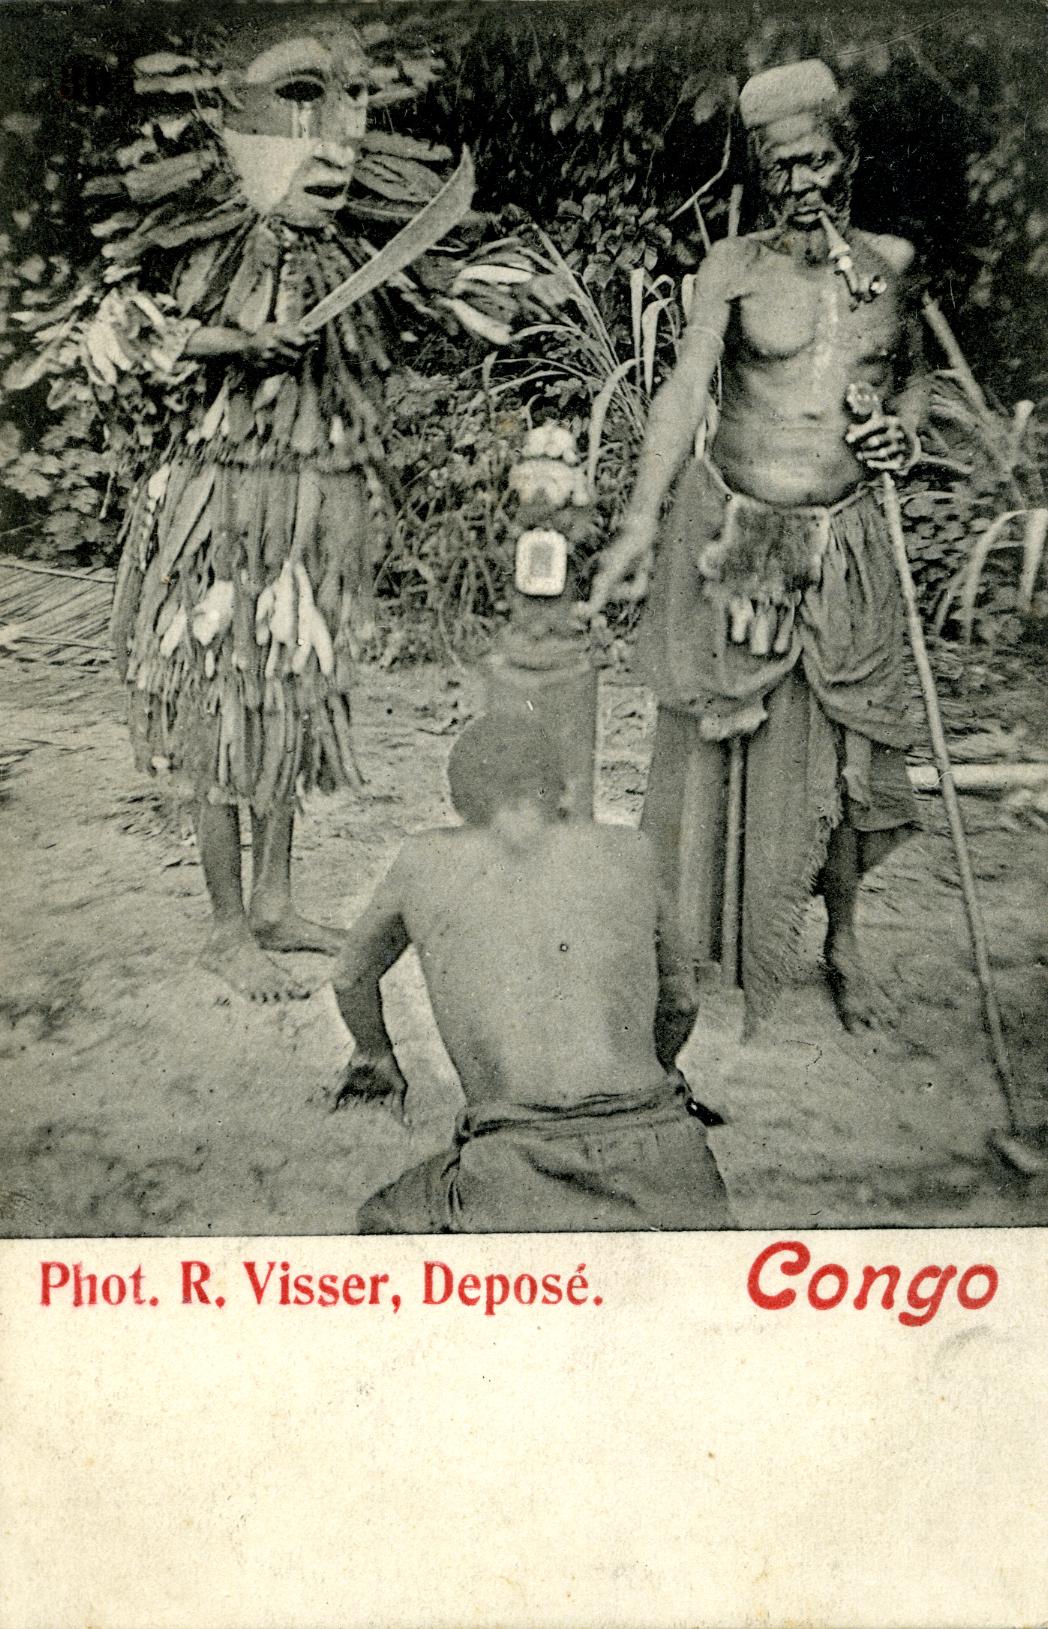 robert-visser-vili-mask-field-photo-postcard-congo